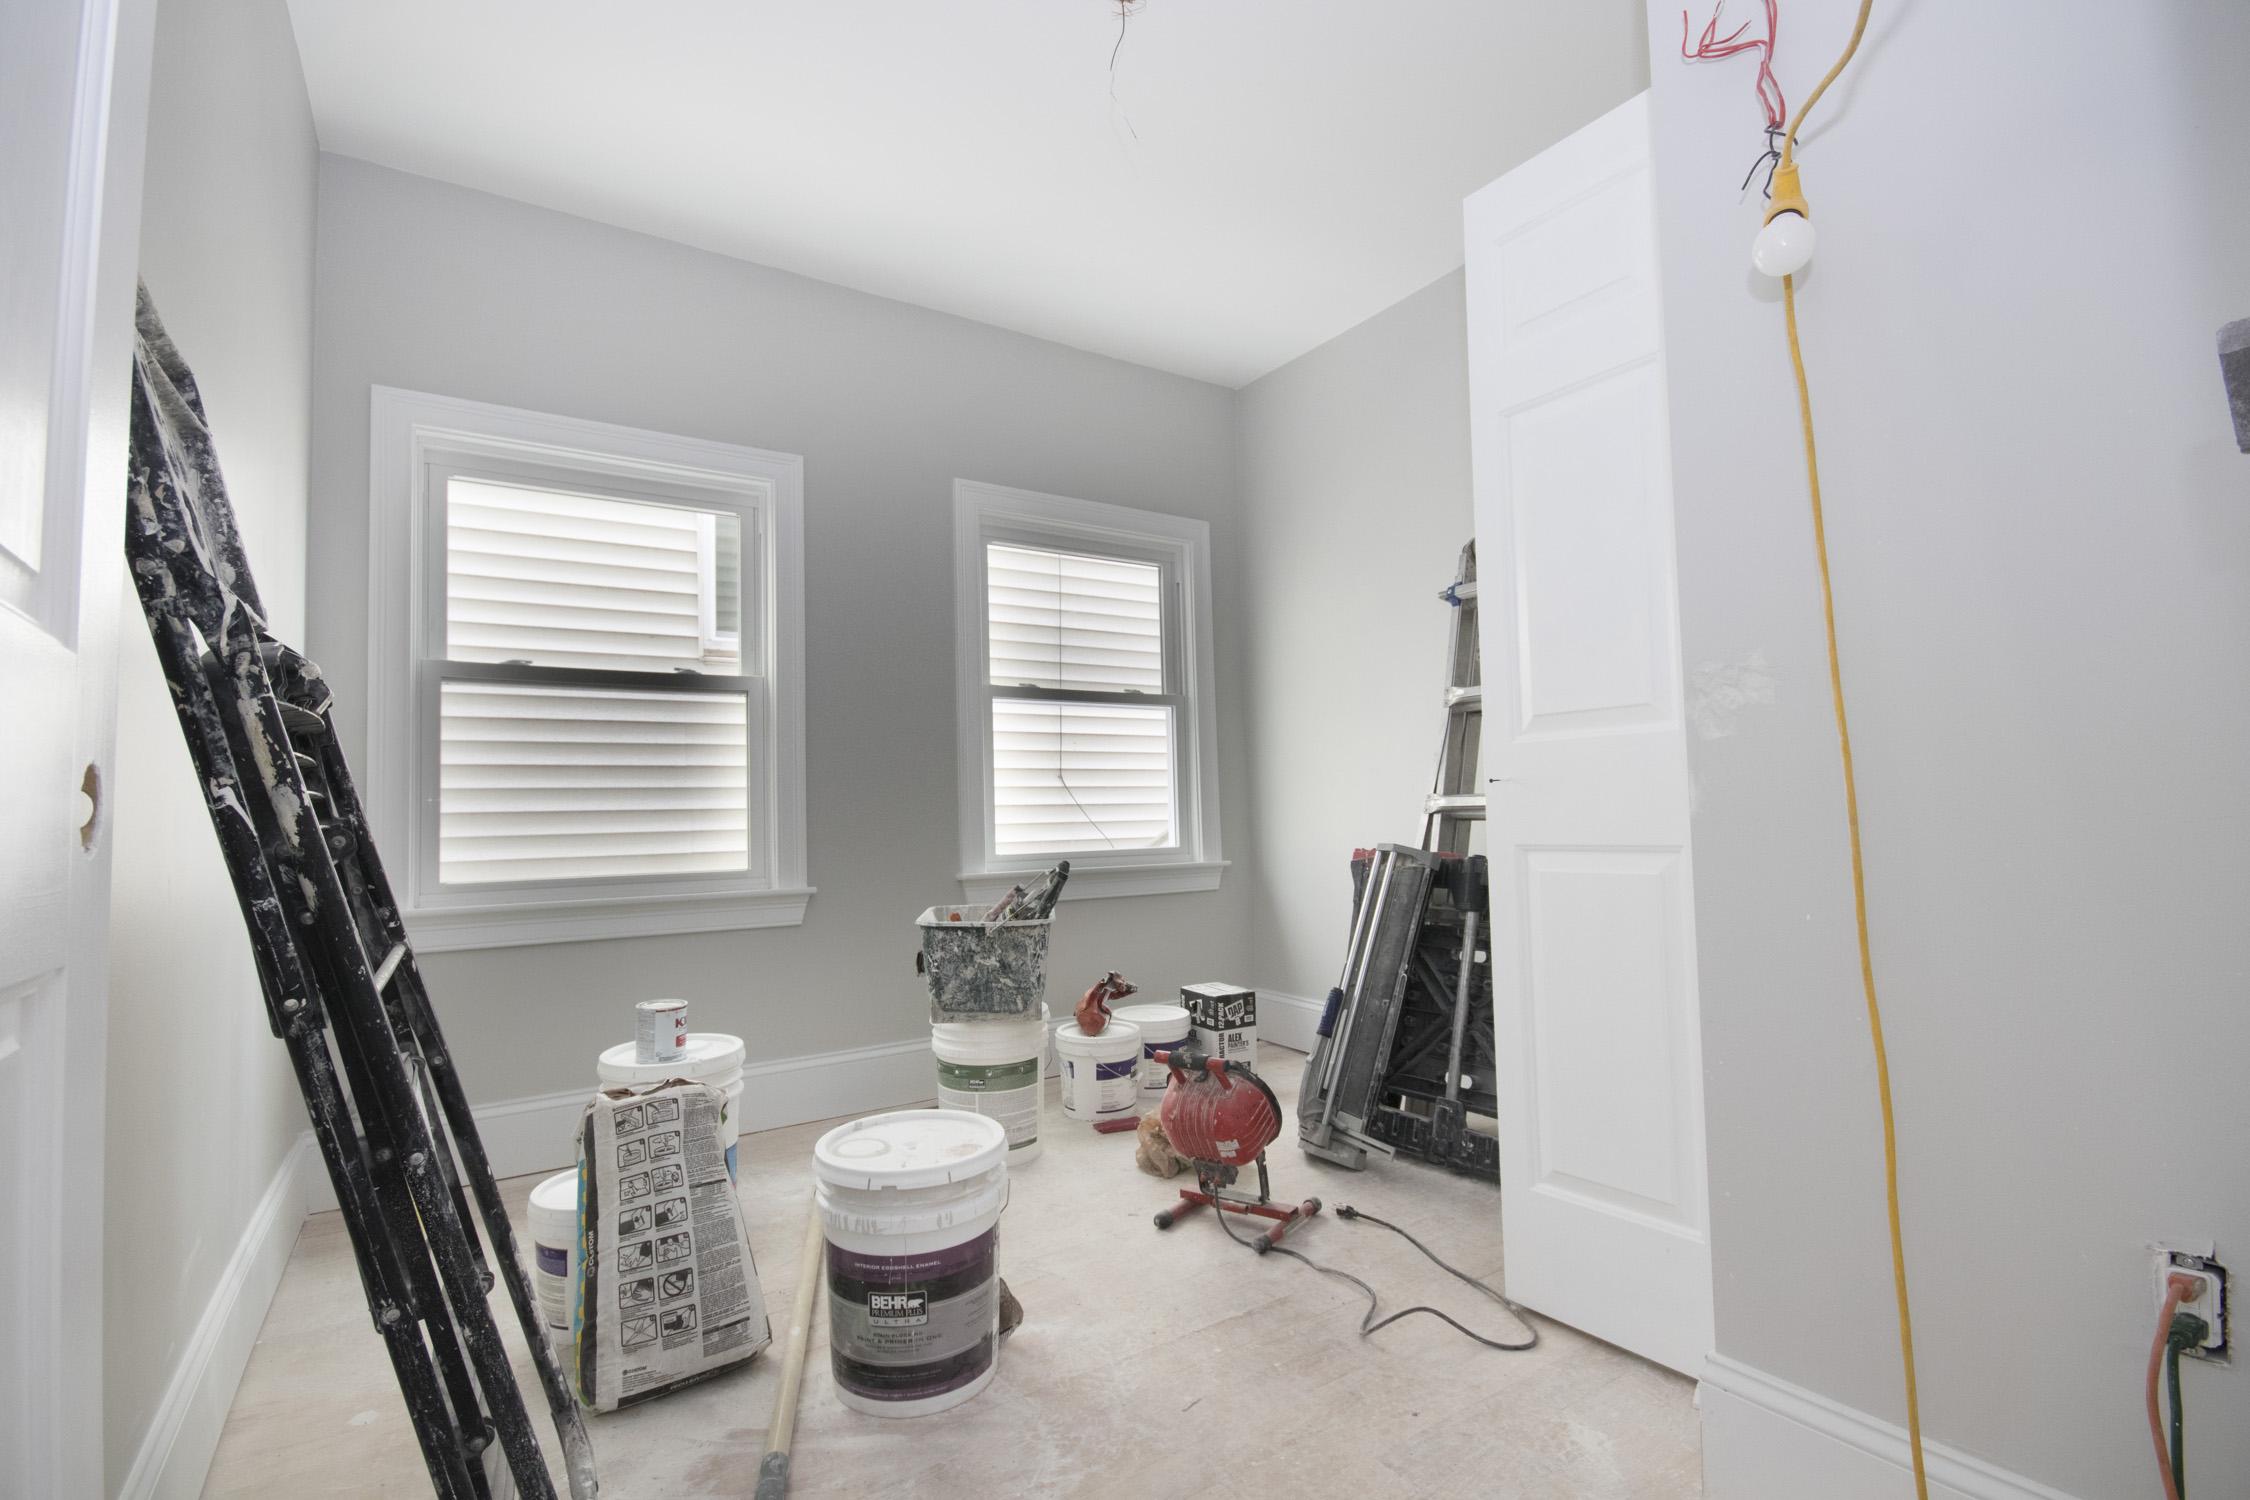 P. Northeast Contractors 27 Darling Street Boston Condo Renovation_35 -